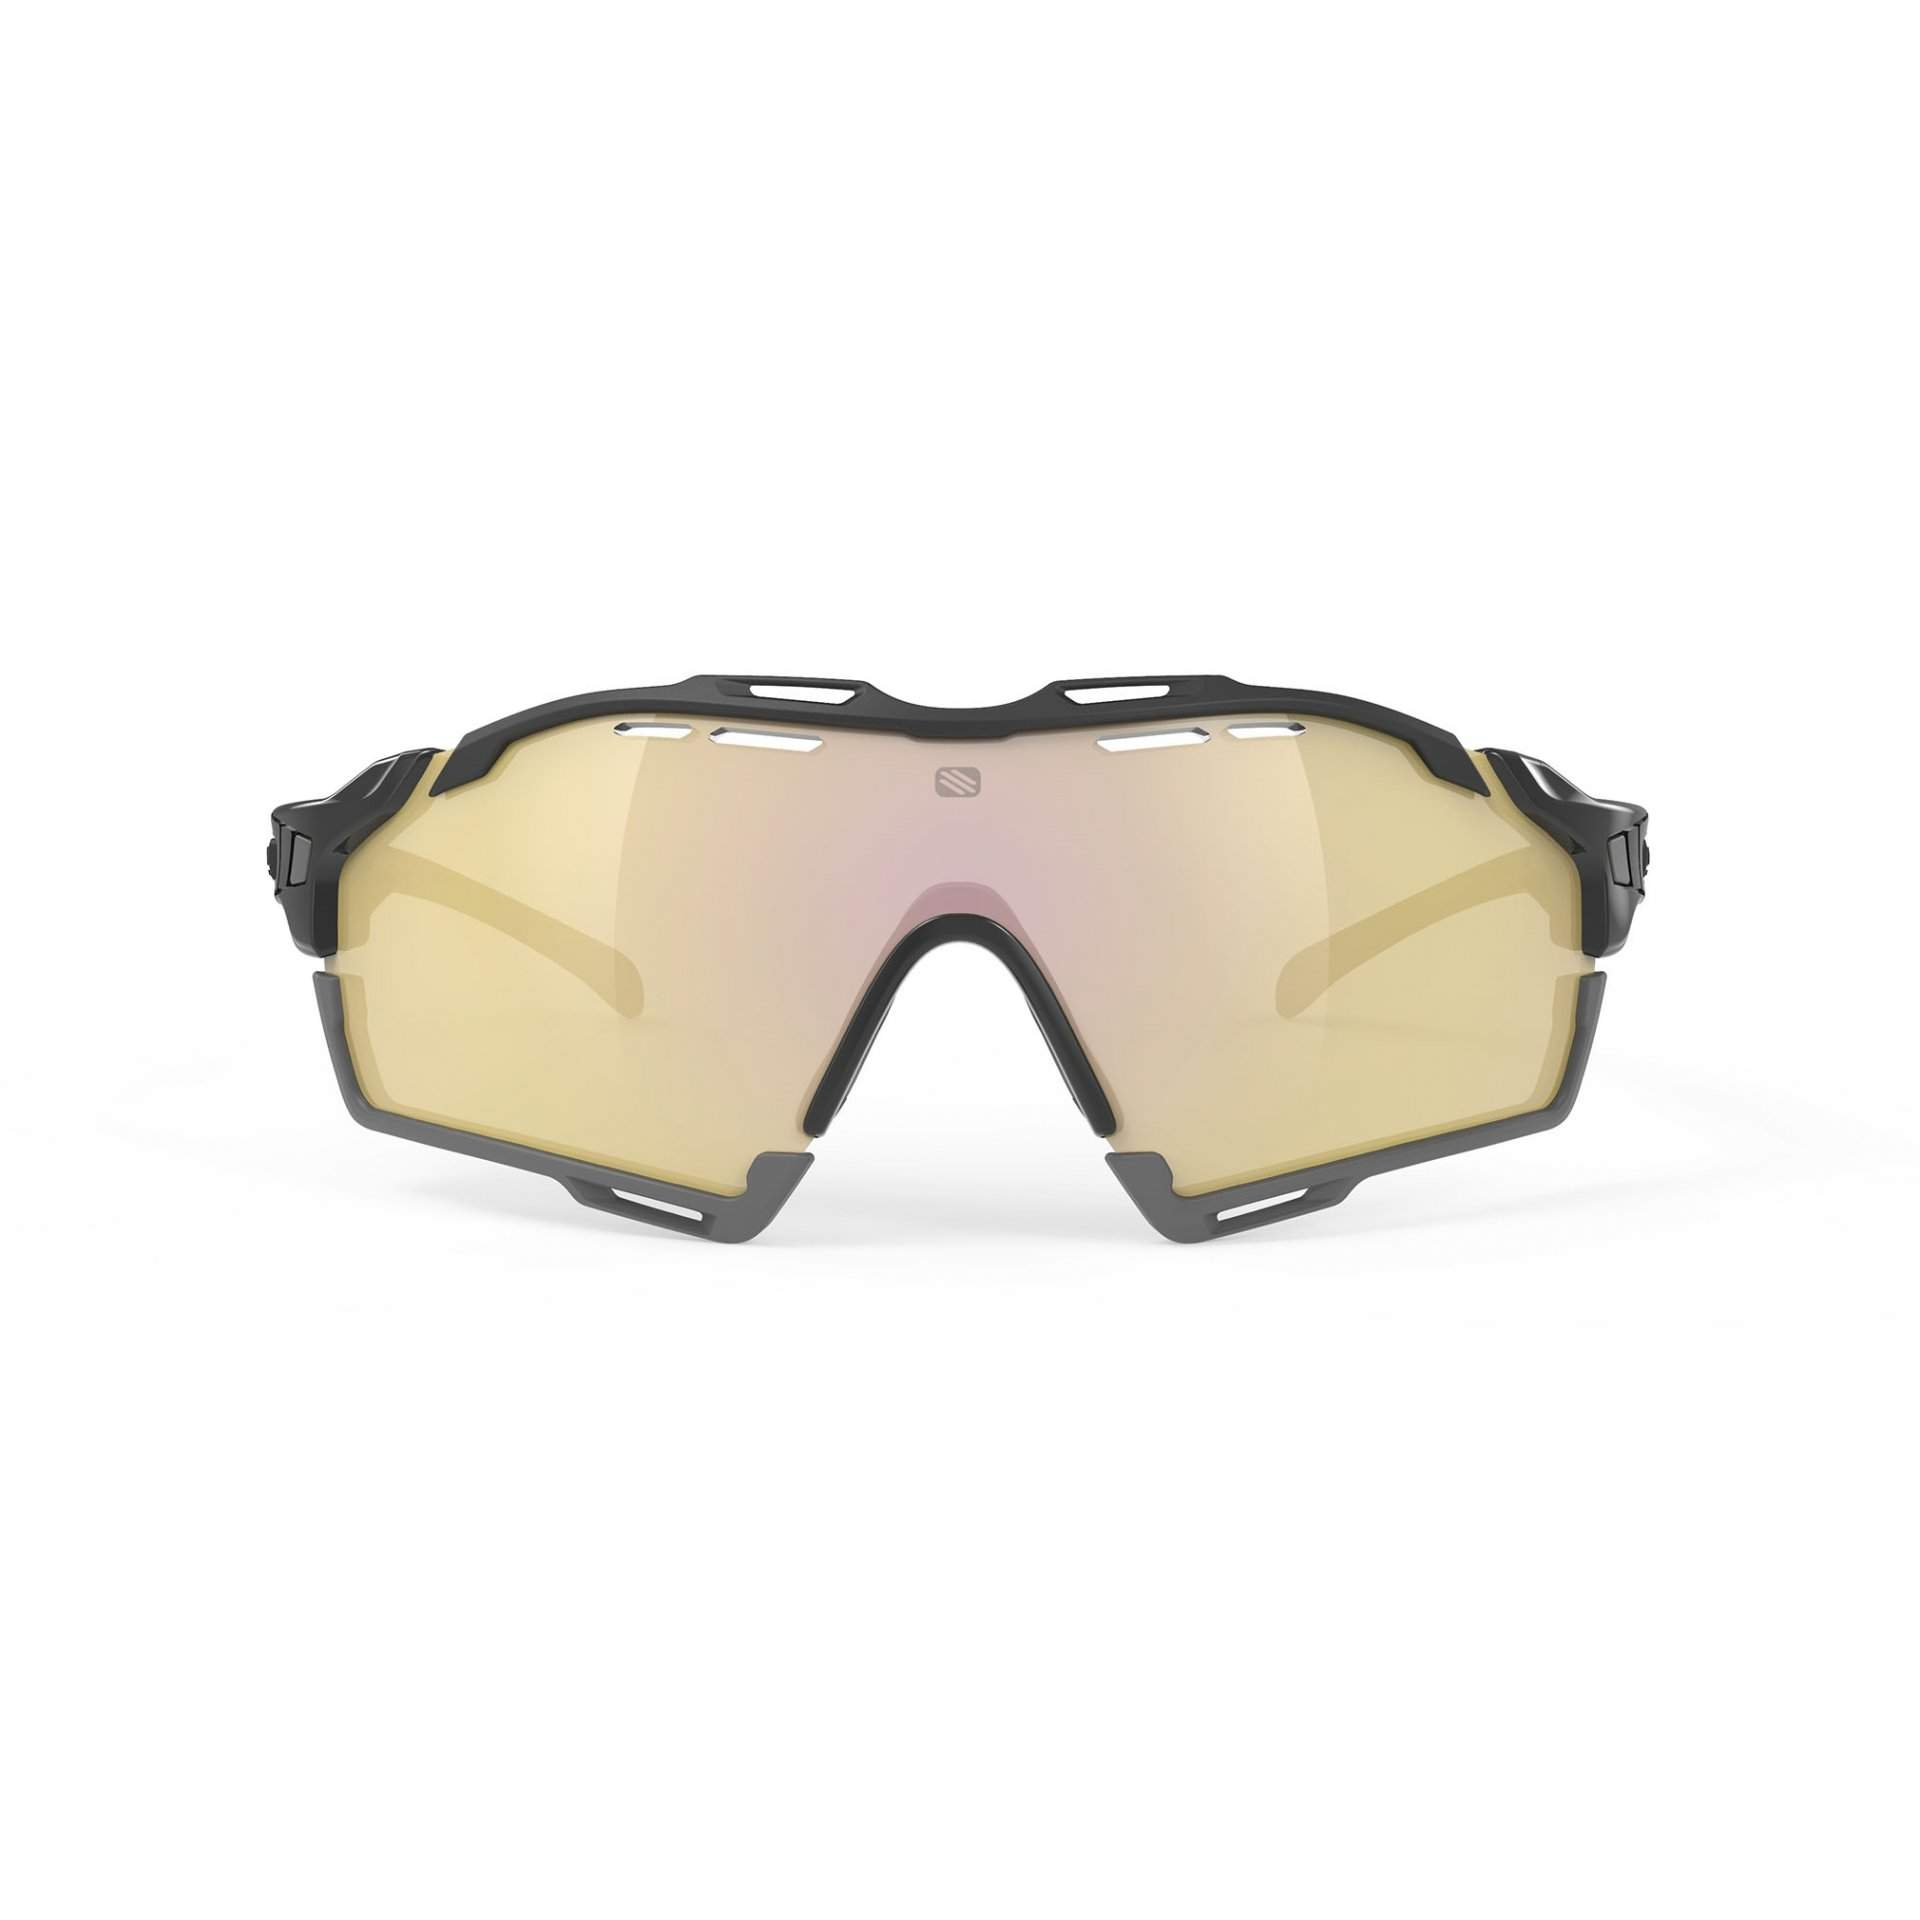 OKULARY RUDY PROJECT CUTLINE MULTILASER GOLD + BLACK GLOSS SP6357420005 PRZÓD